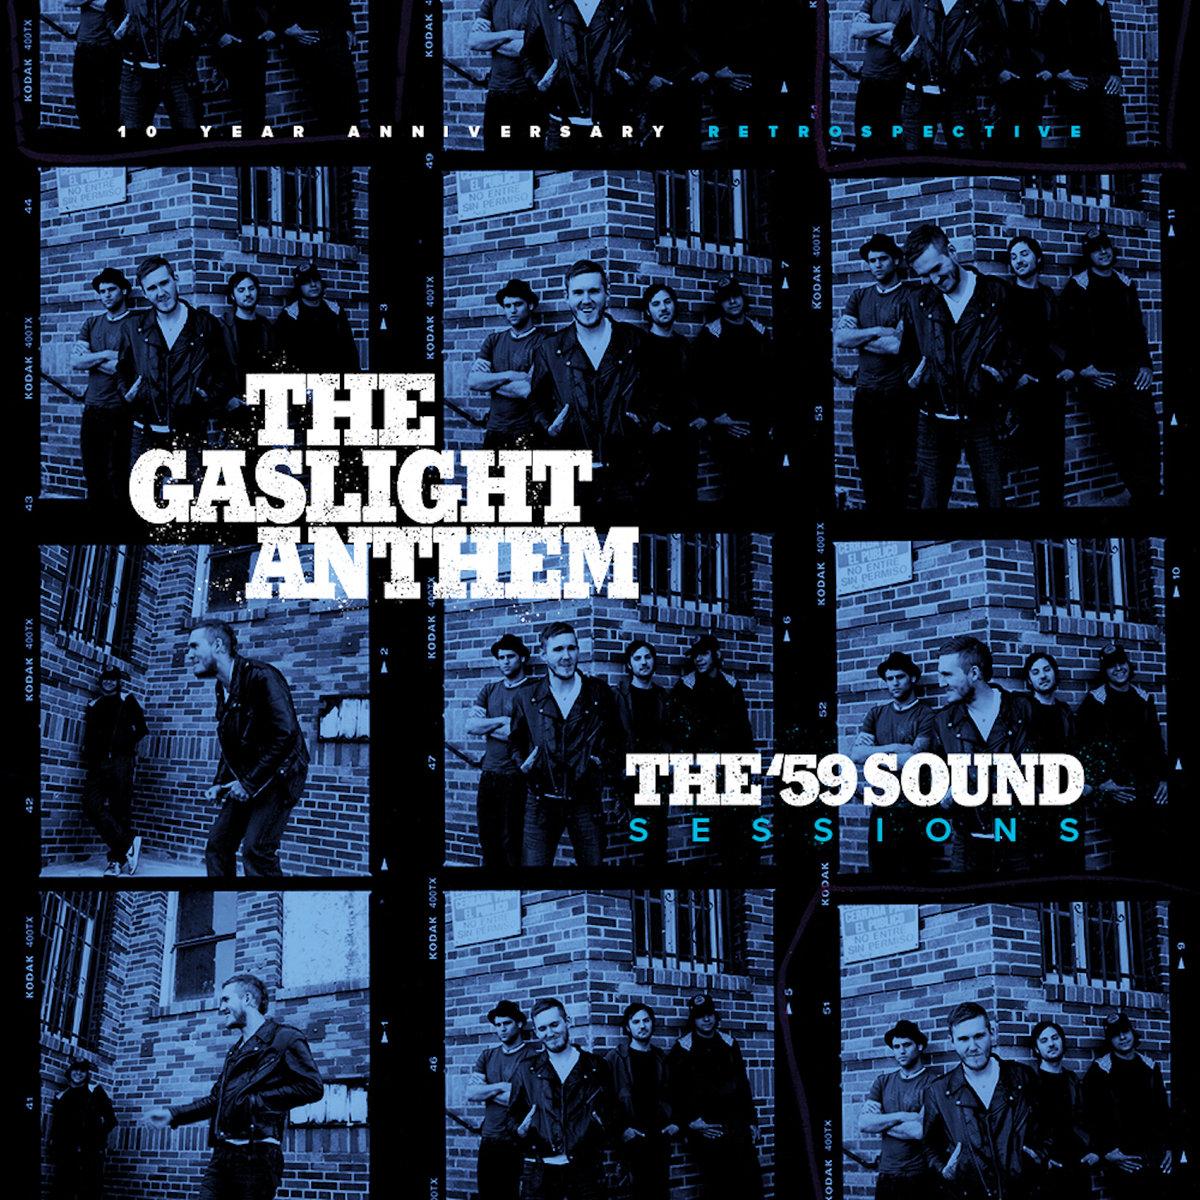 The Gaslight Anthem - The '59 Sound Sessions LP